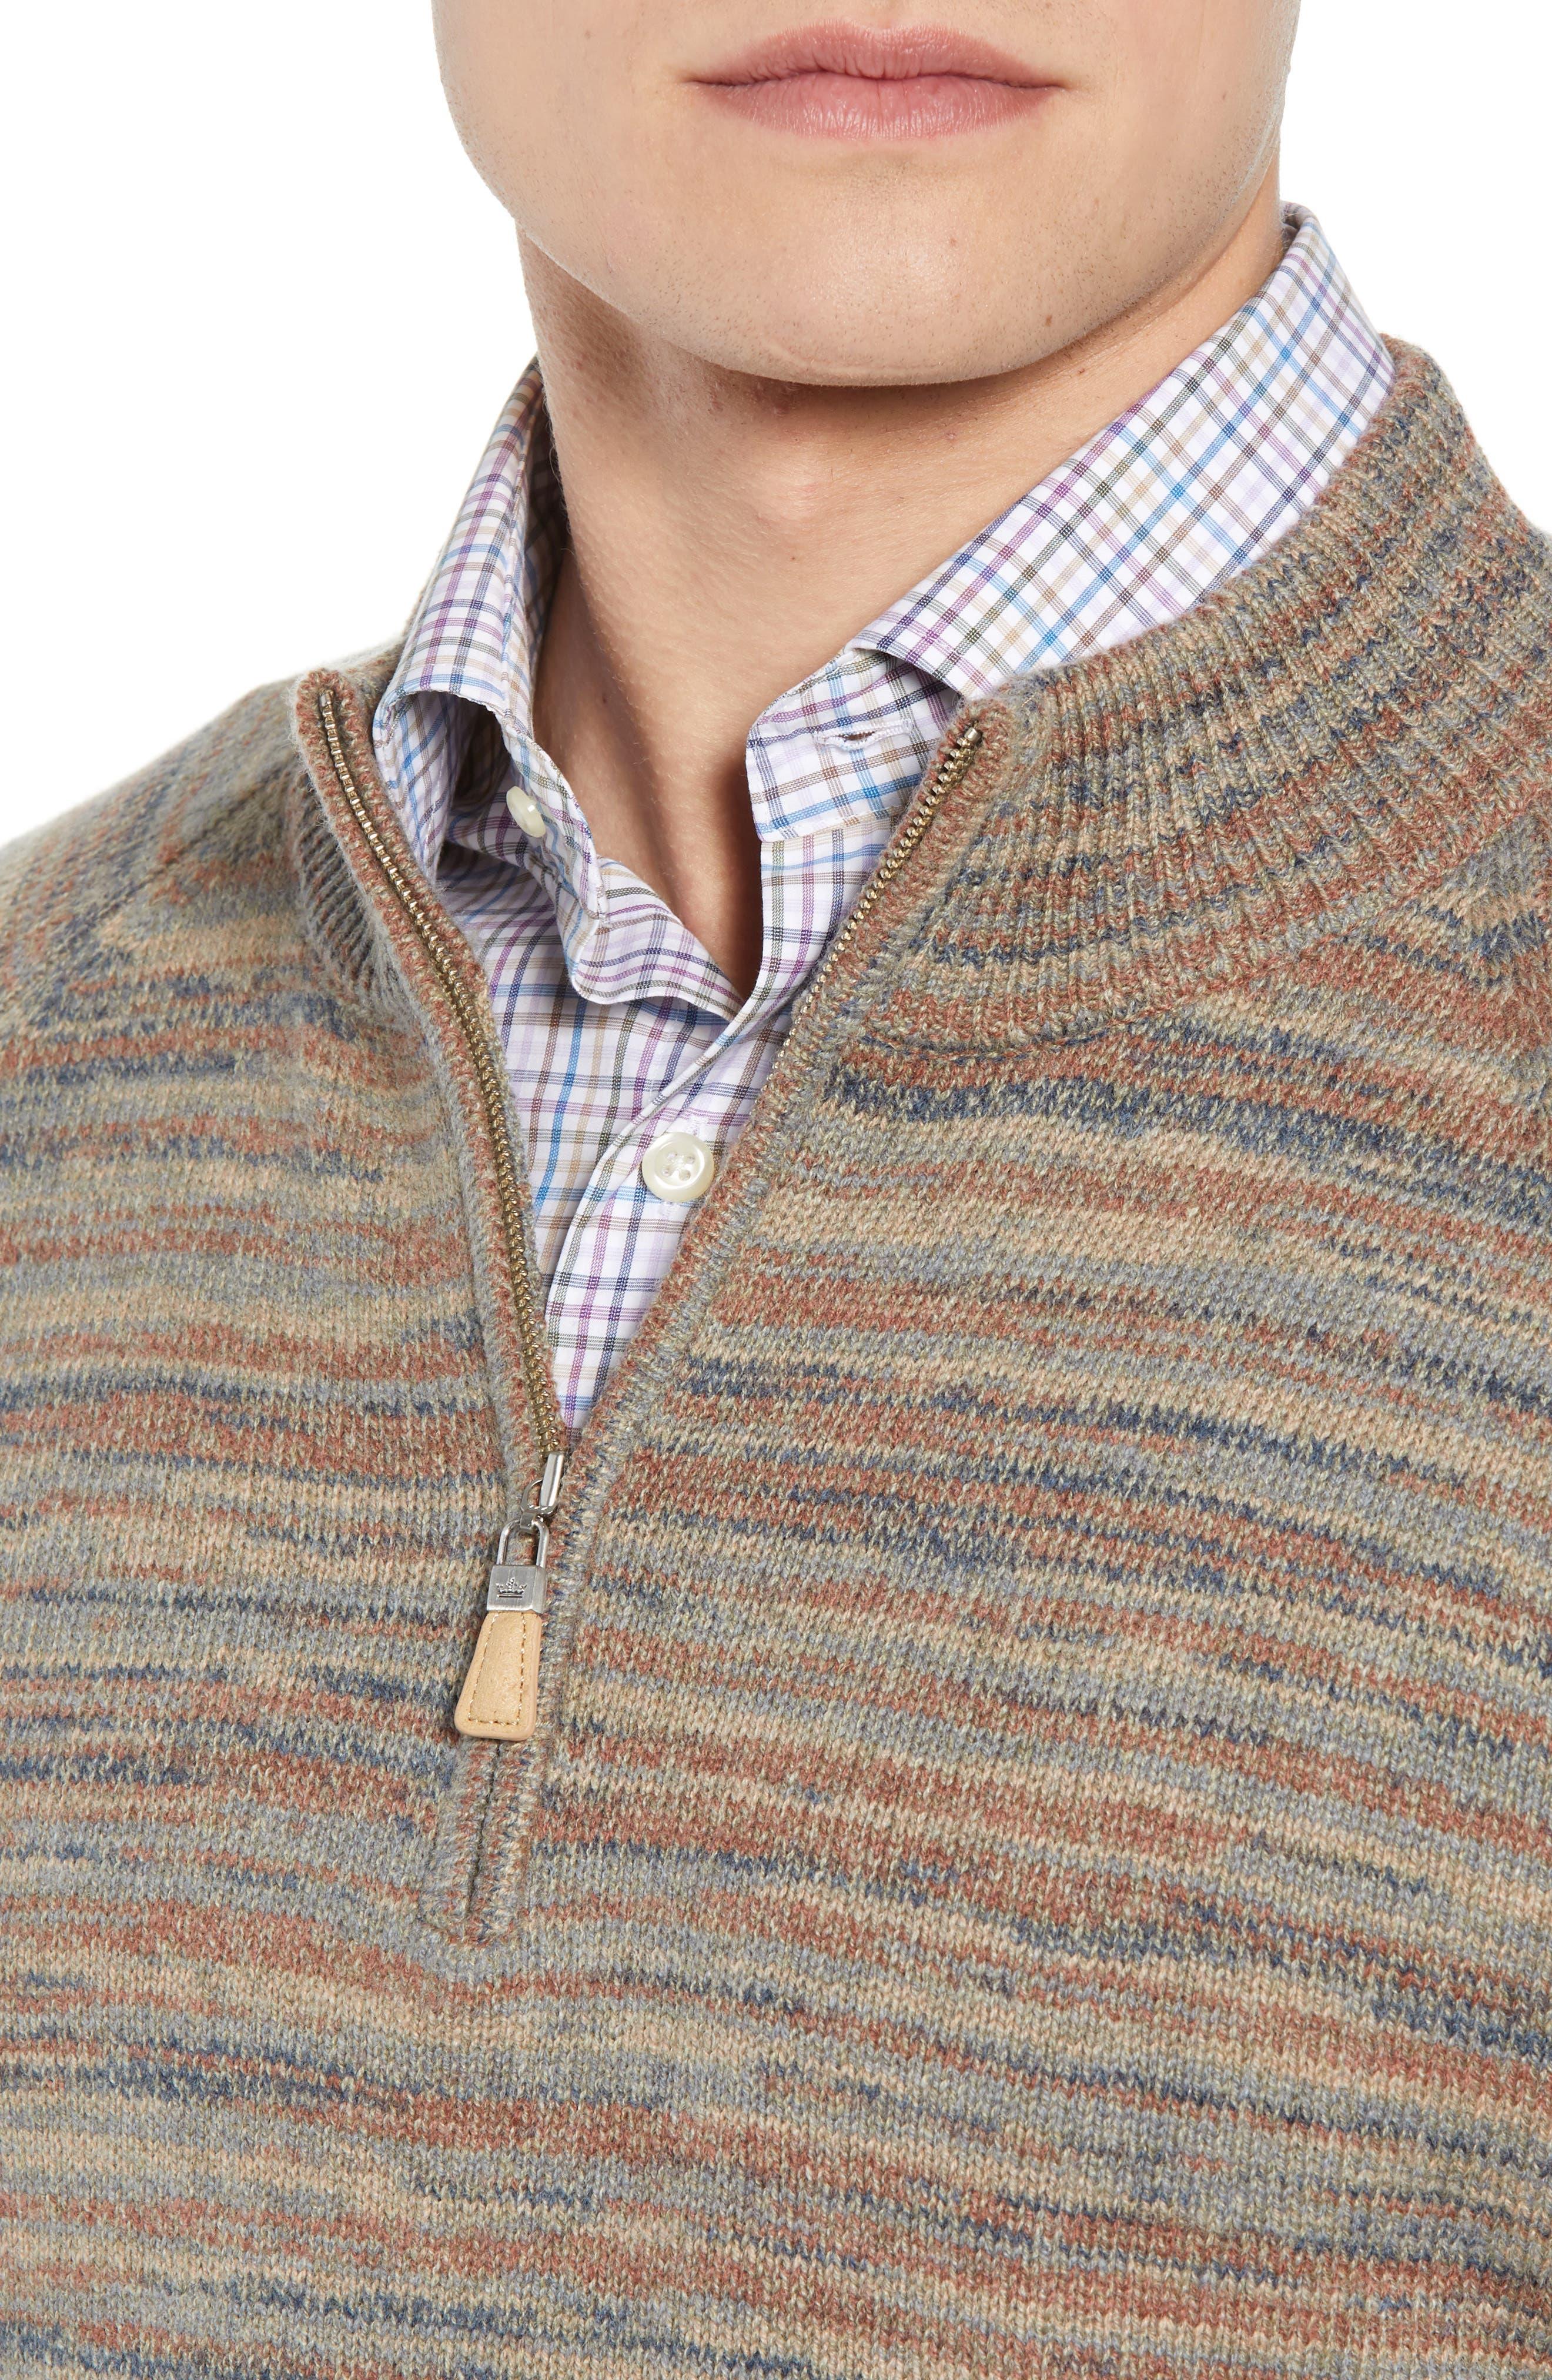 Twisted Cashmere Quarter Zip Sweater,                             Alternate thumbnail 4, color,                             BEIGE